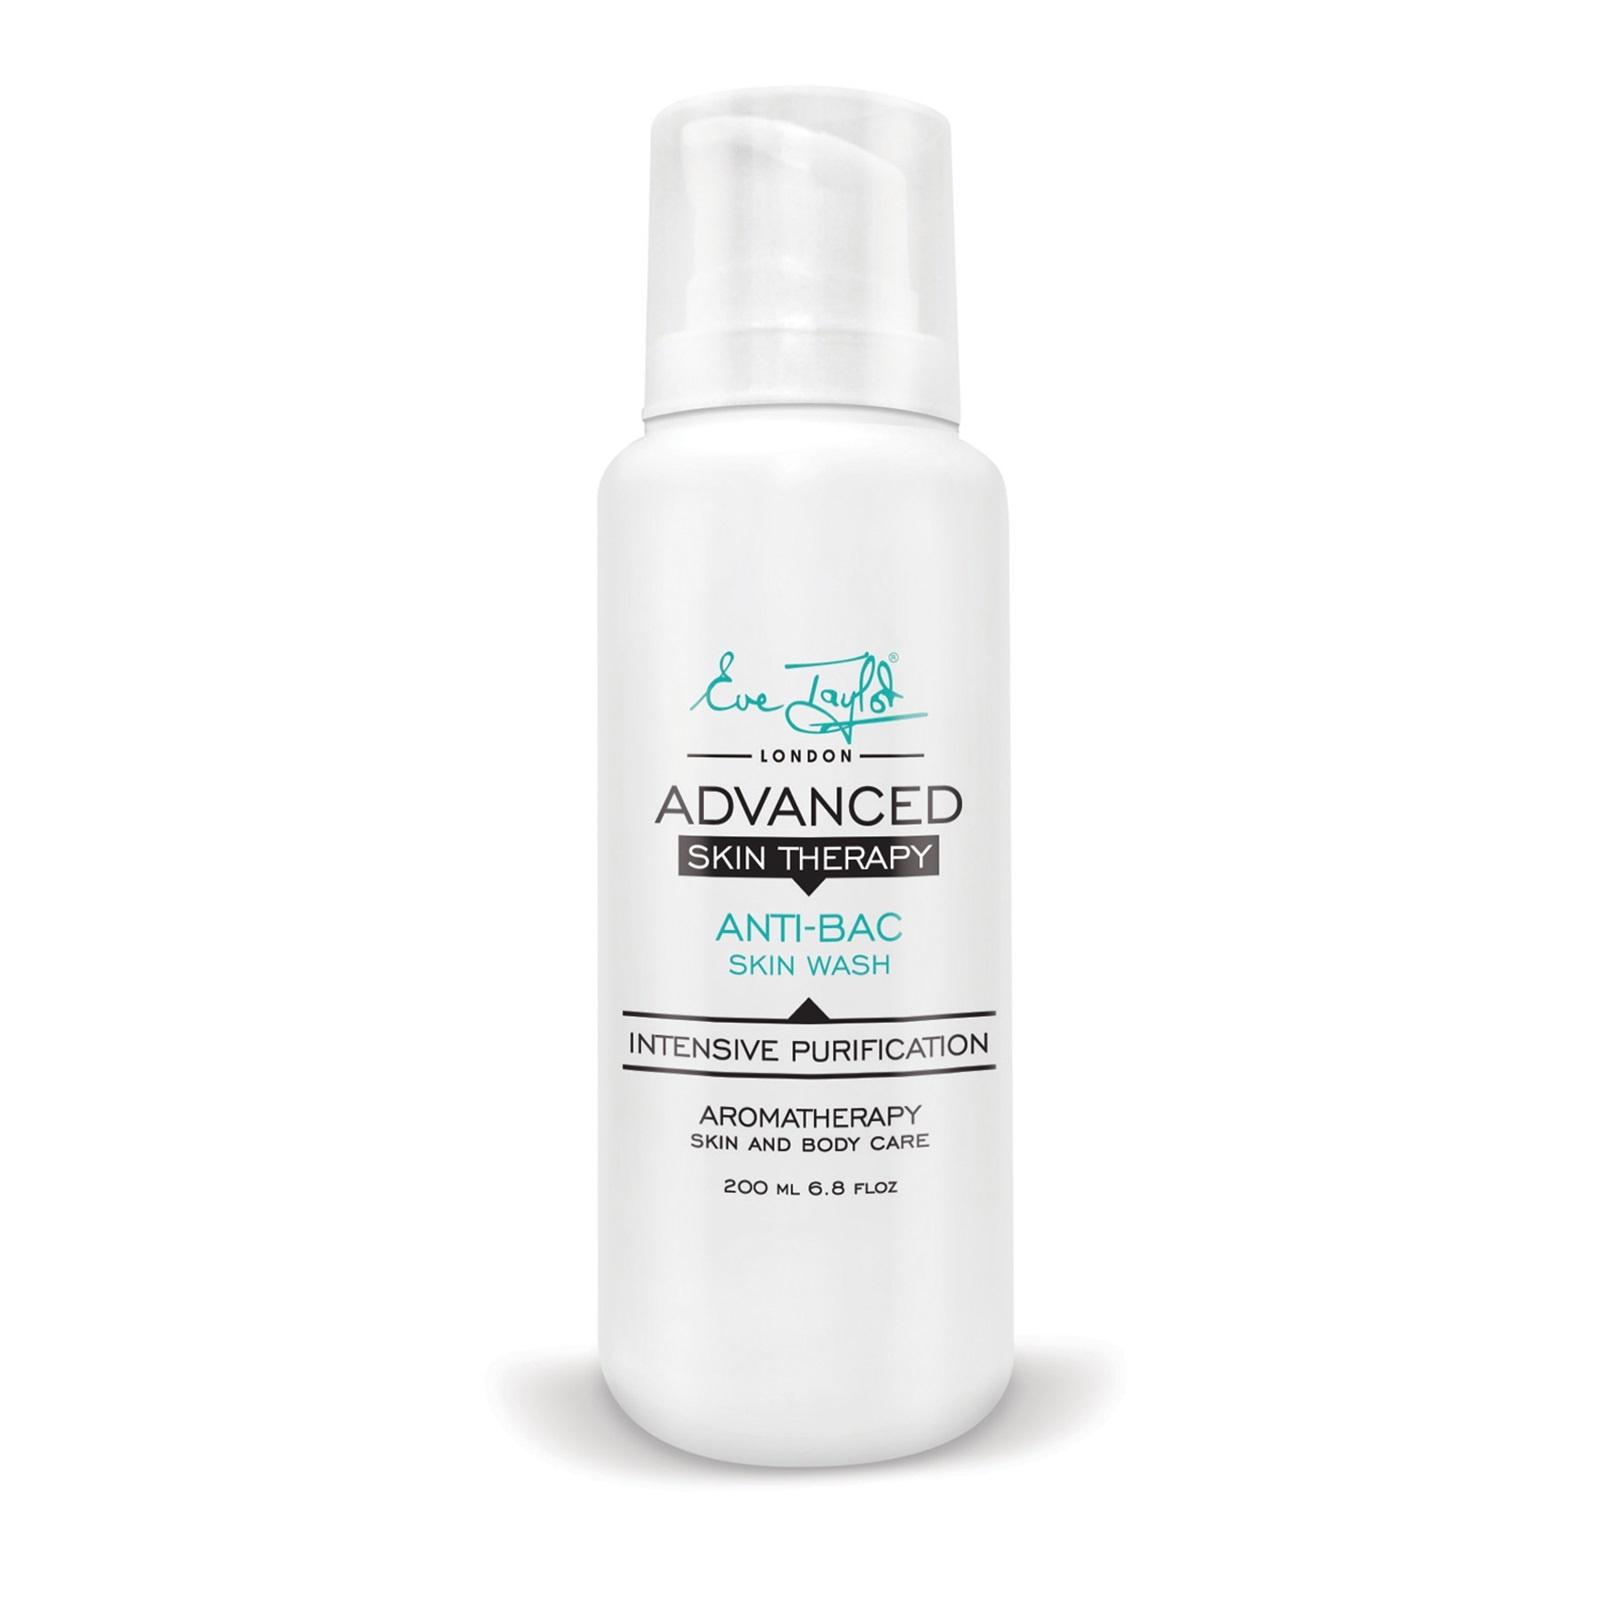 Eve Taylor Clarifying Skin Wash  (Voorheen  Anti-Bac Skin Wash) - Eve Taylor